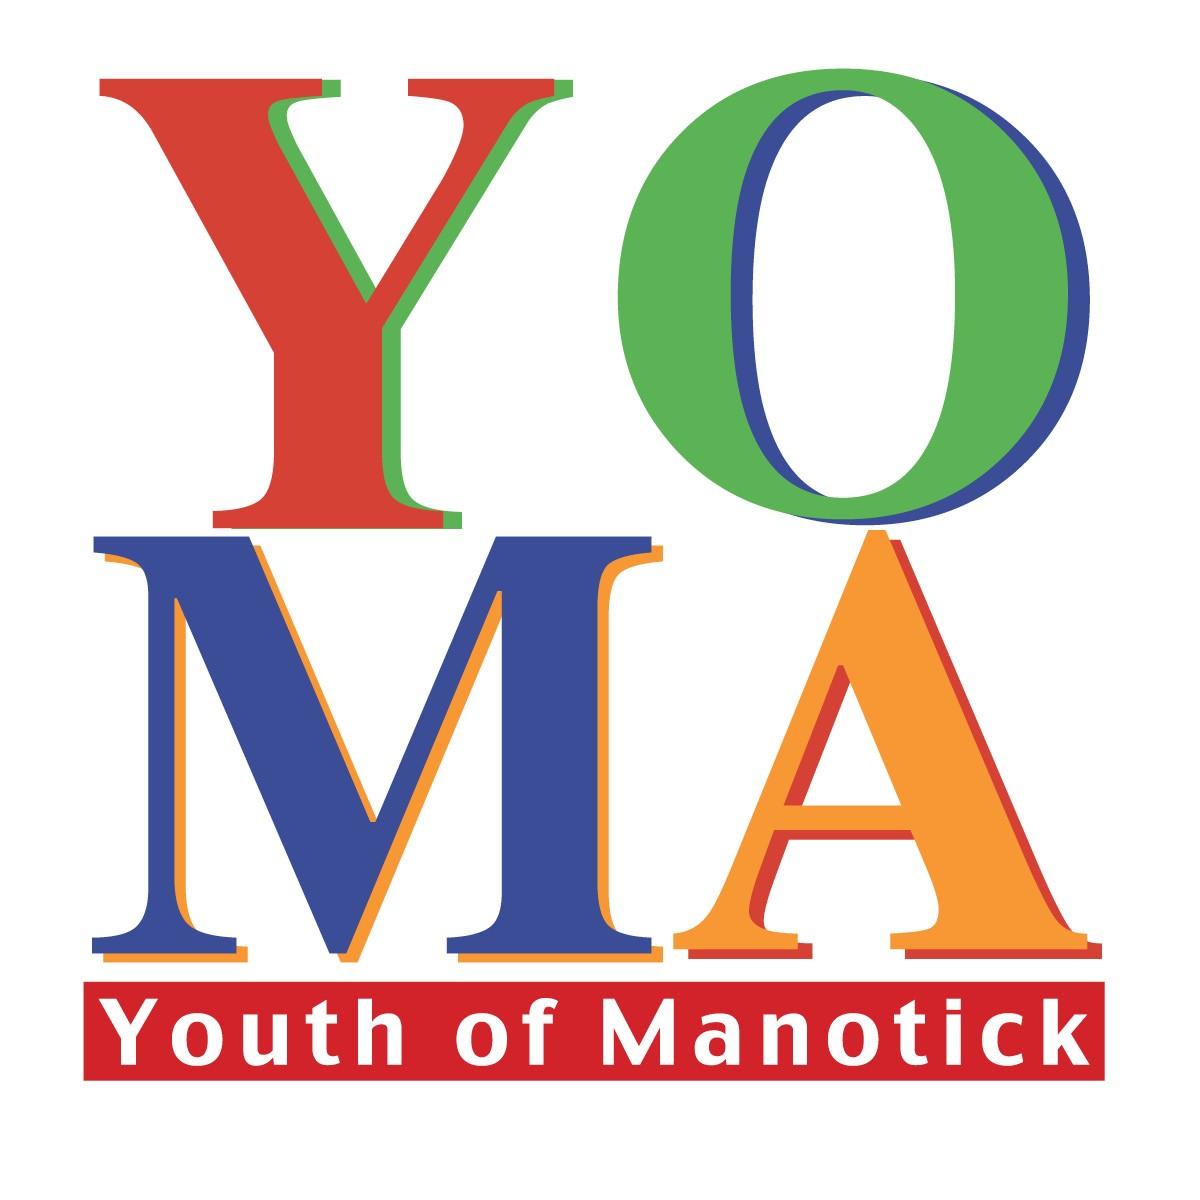 Youth of Manotick Association logo - Business in Manotick